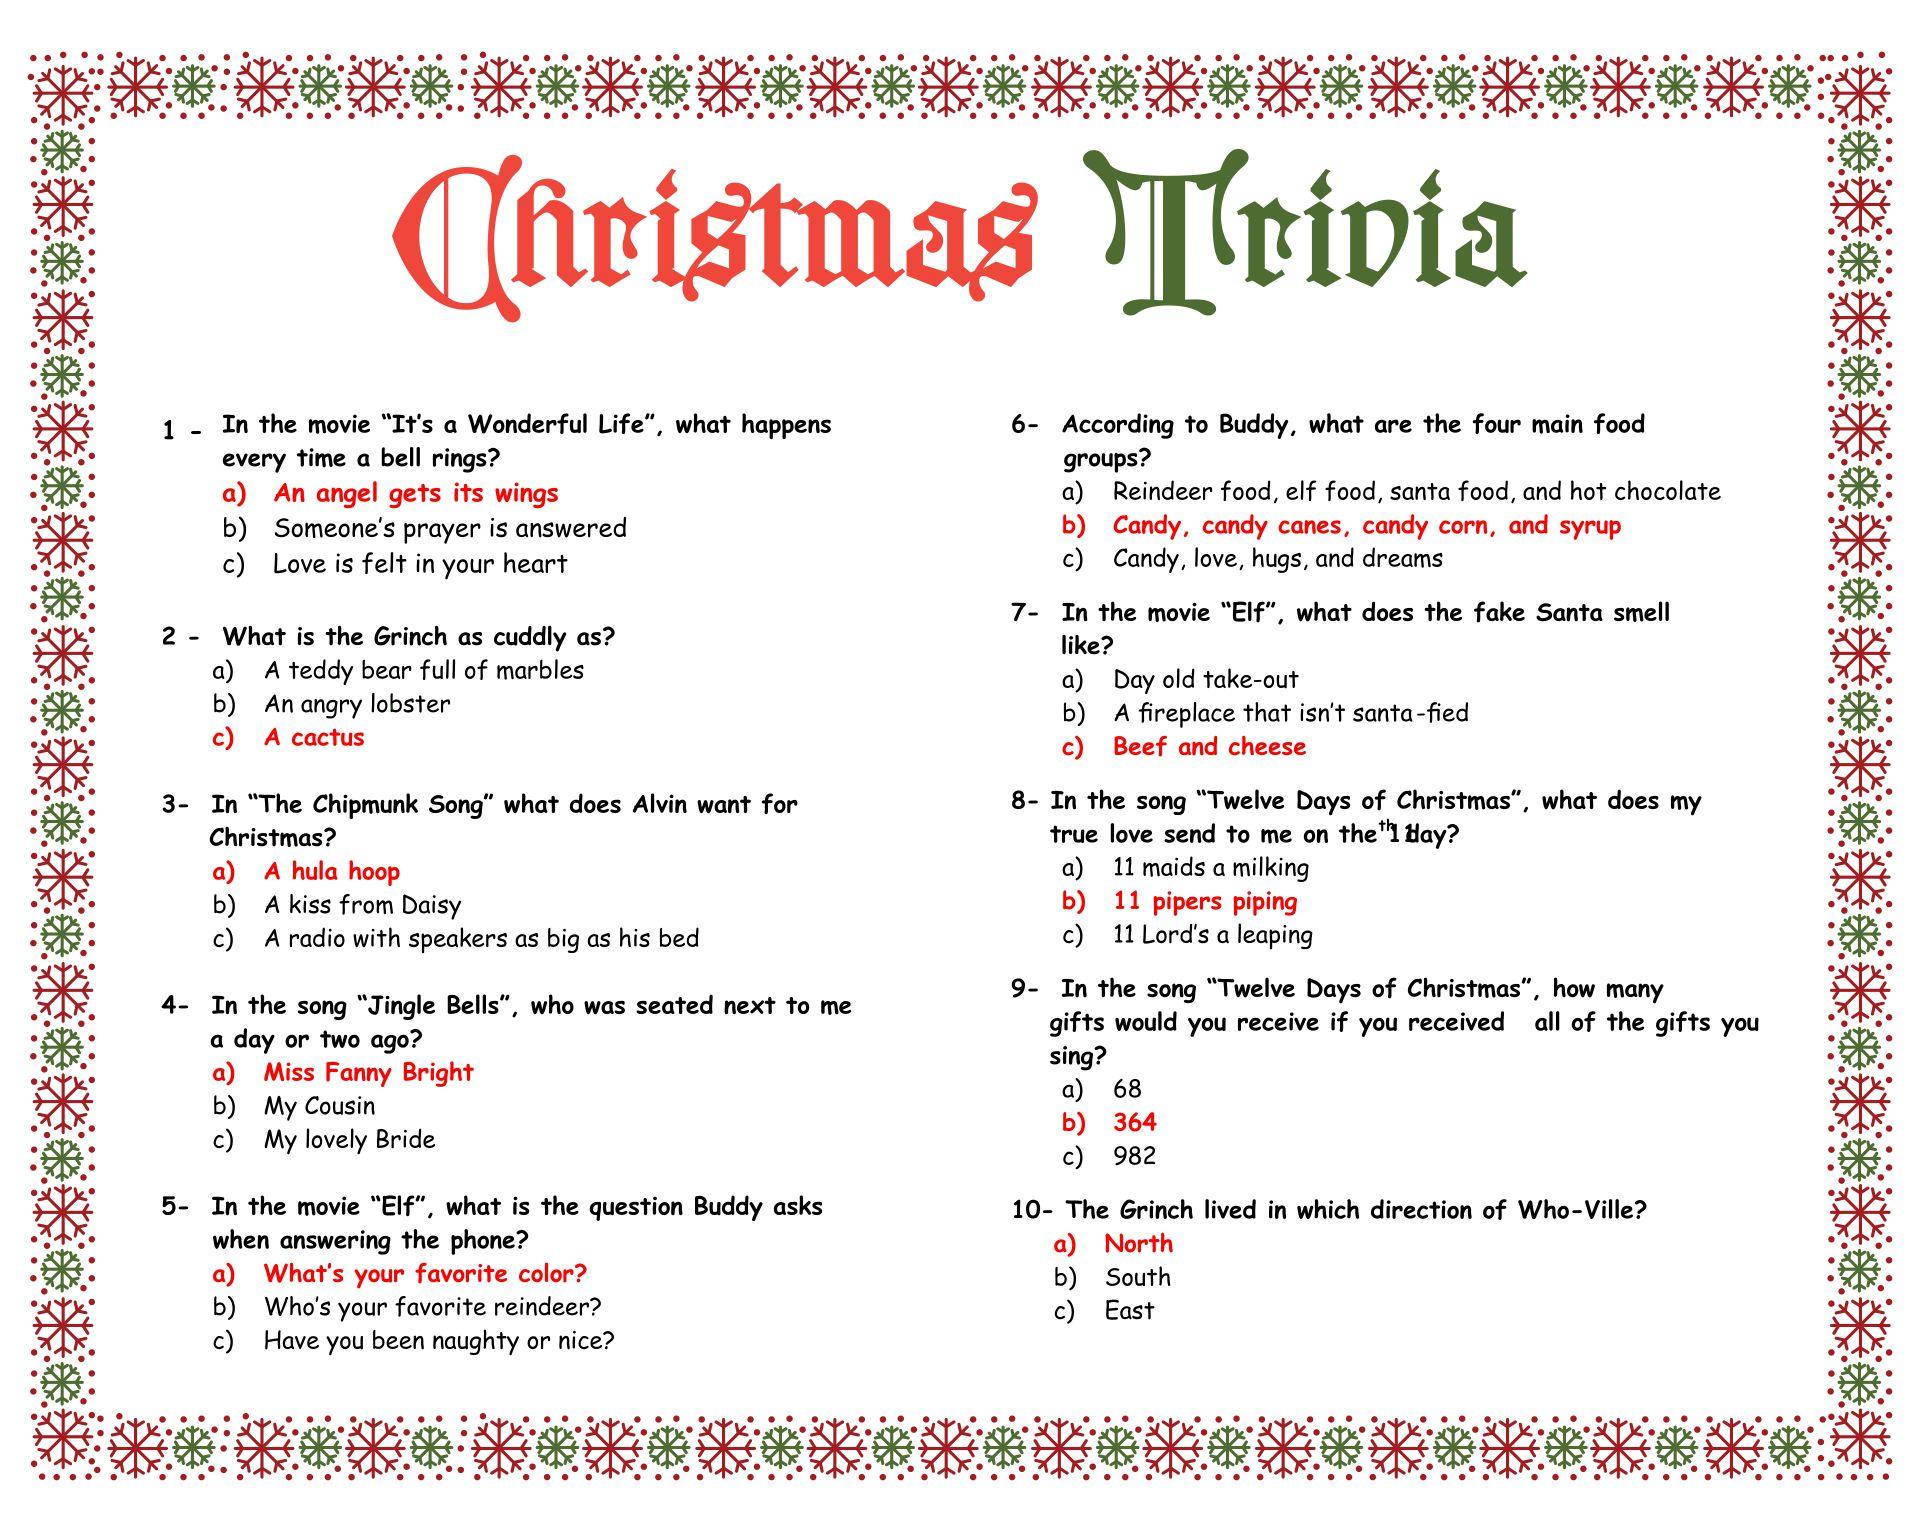 6 Images of Easy Christmas Trivia Printable